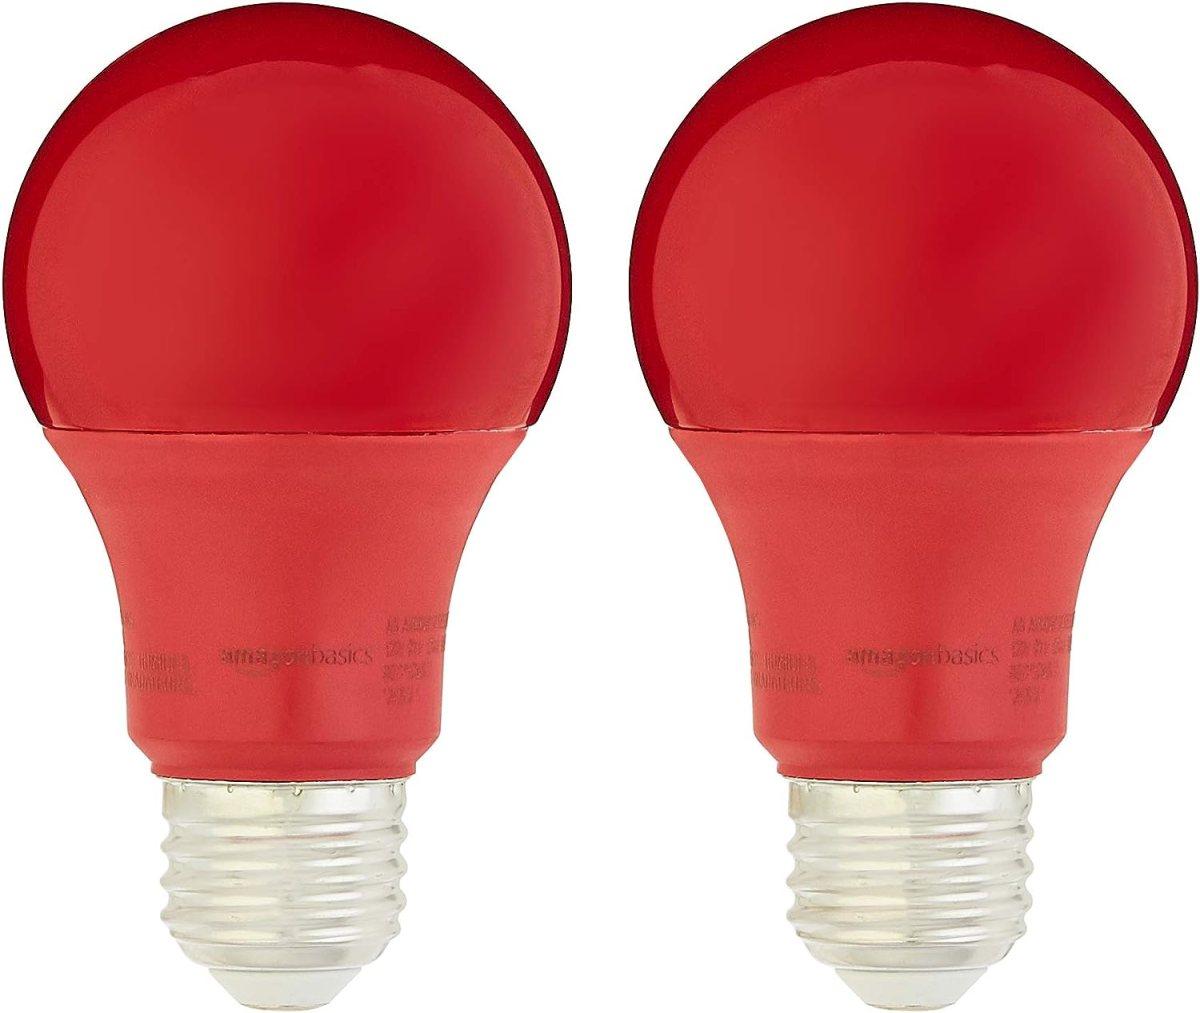 A19 LED Light Bulb   Red